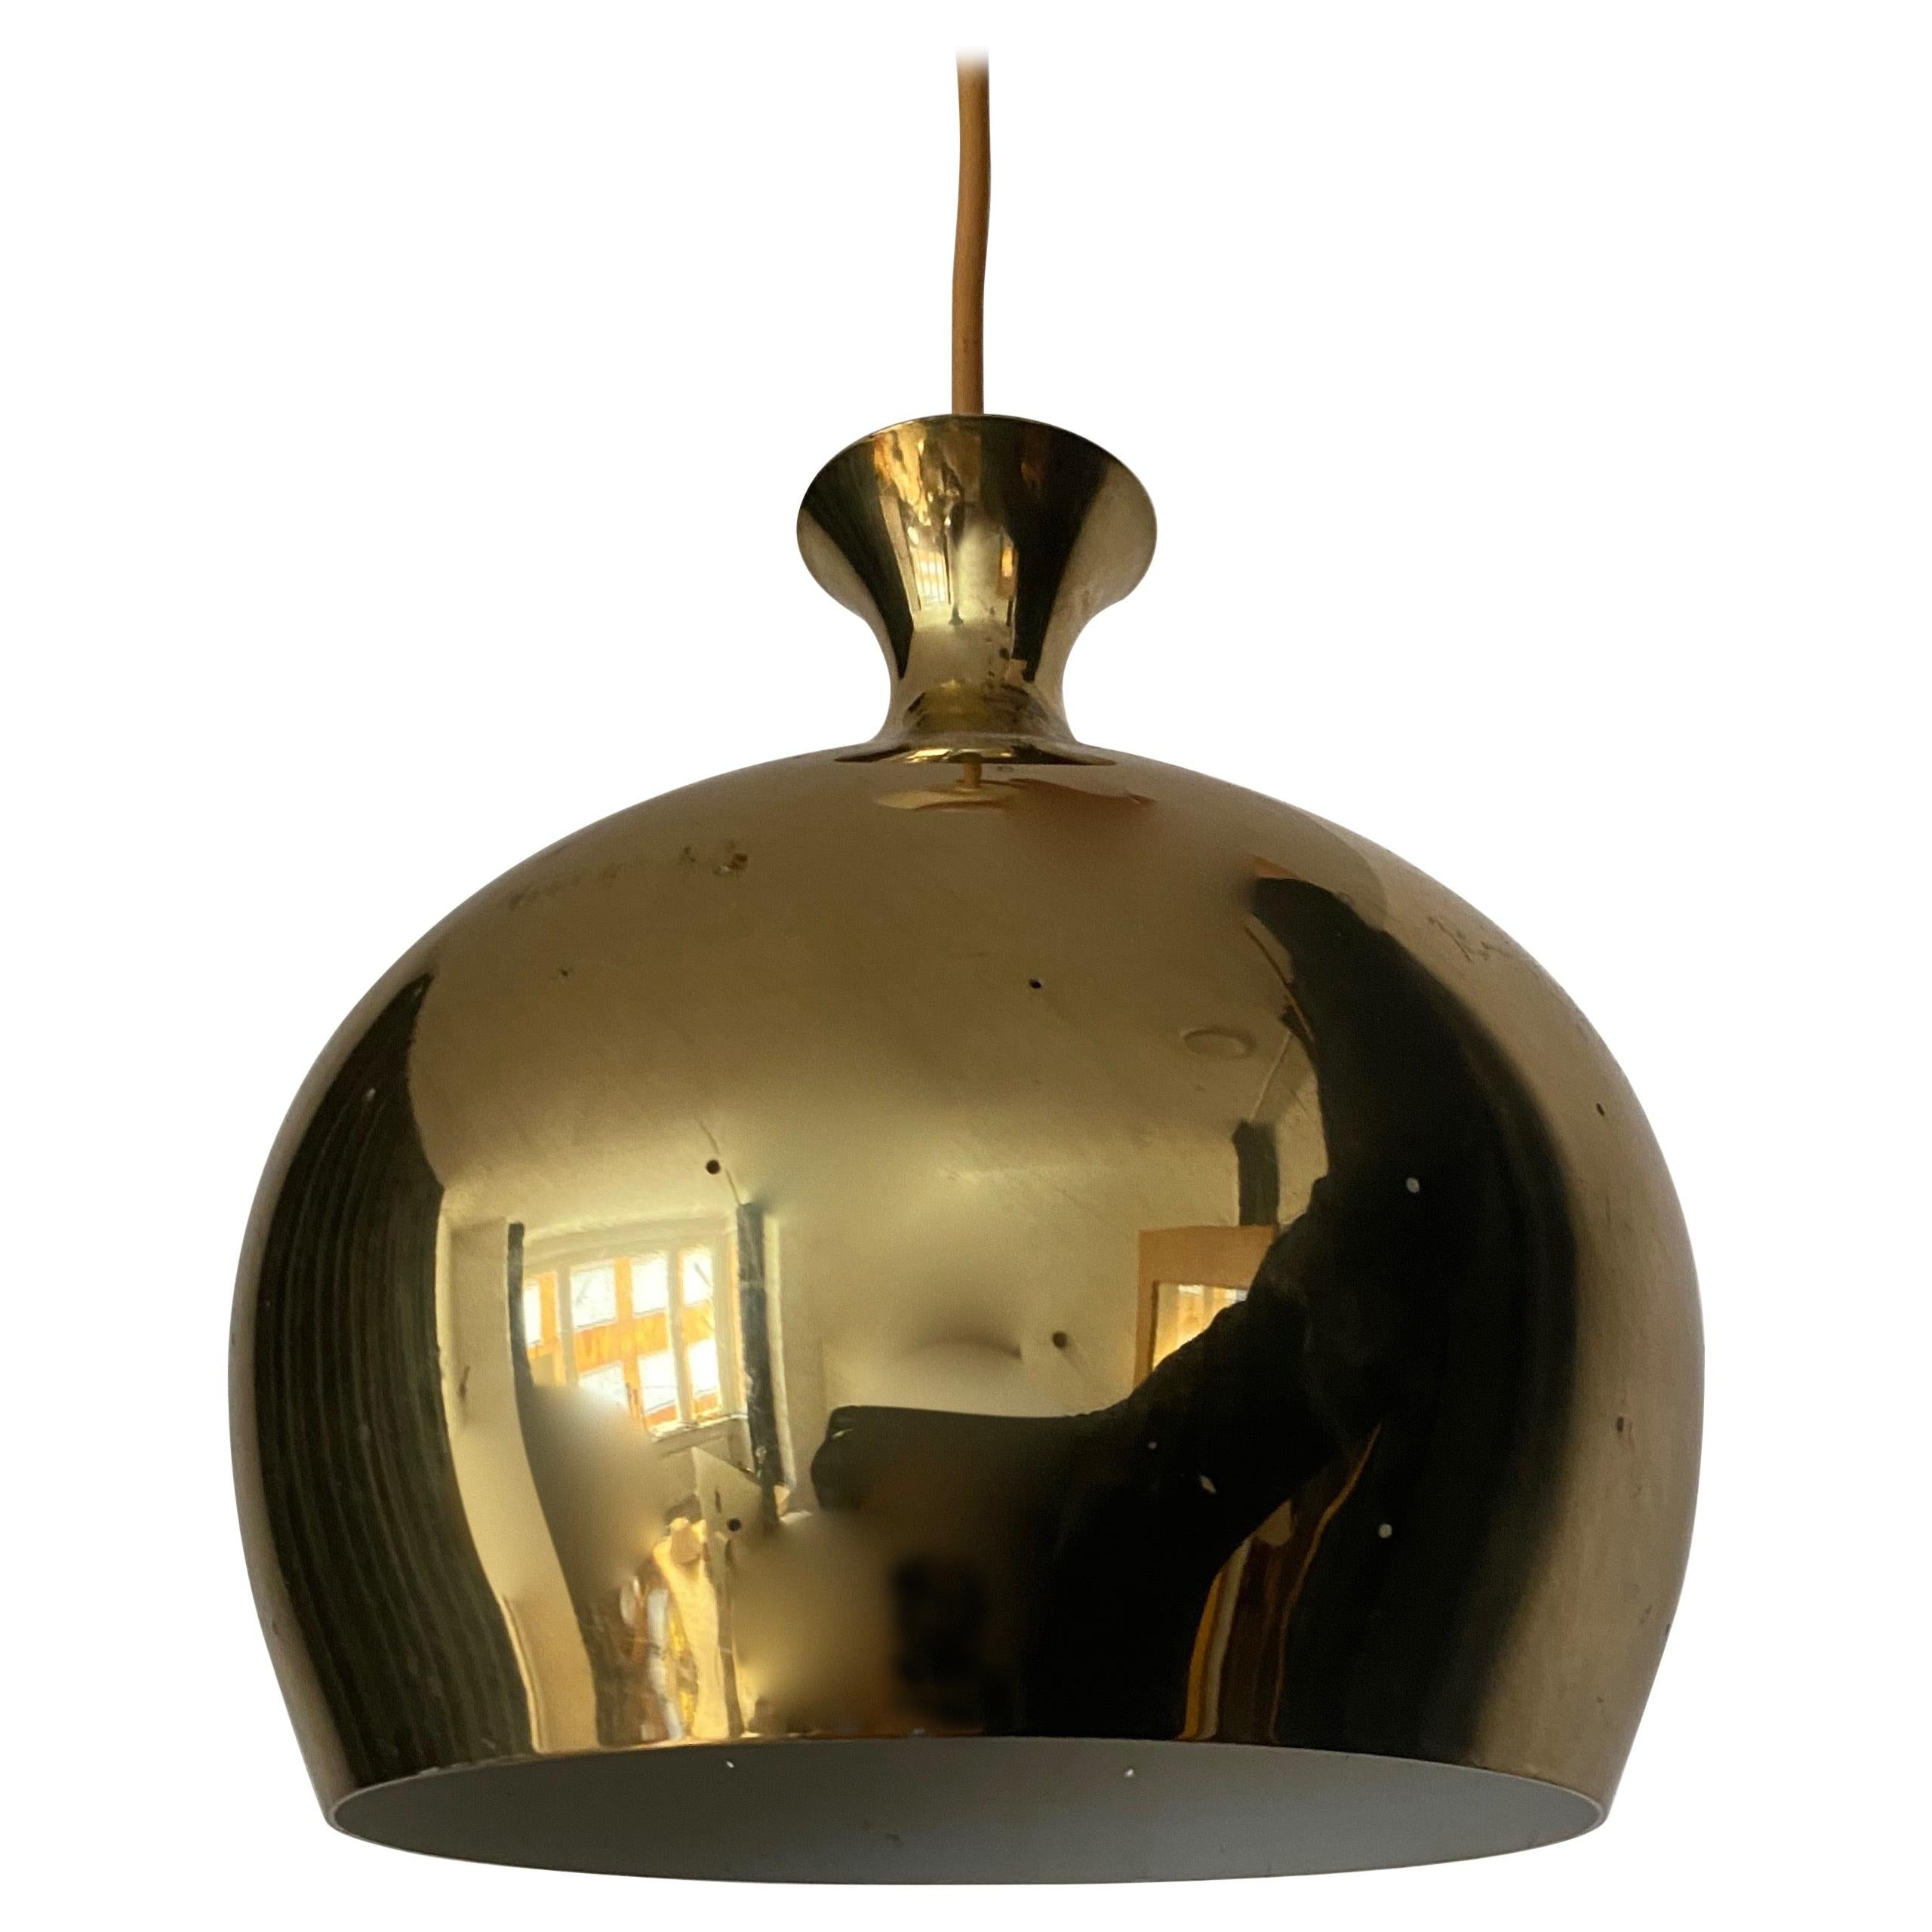 Falkenbergs Belysning, Pendant Lamp, Polished Perforated Brass, Sweden, 1960s